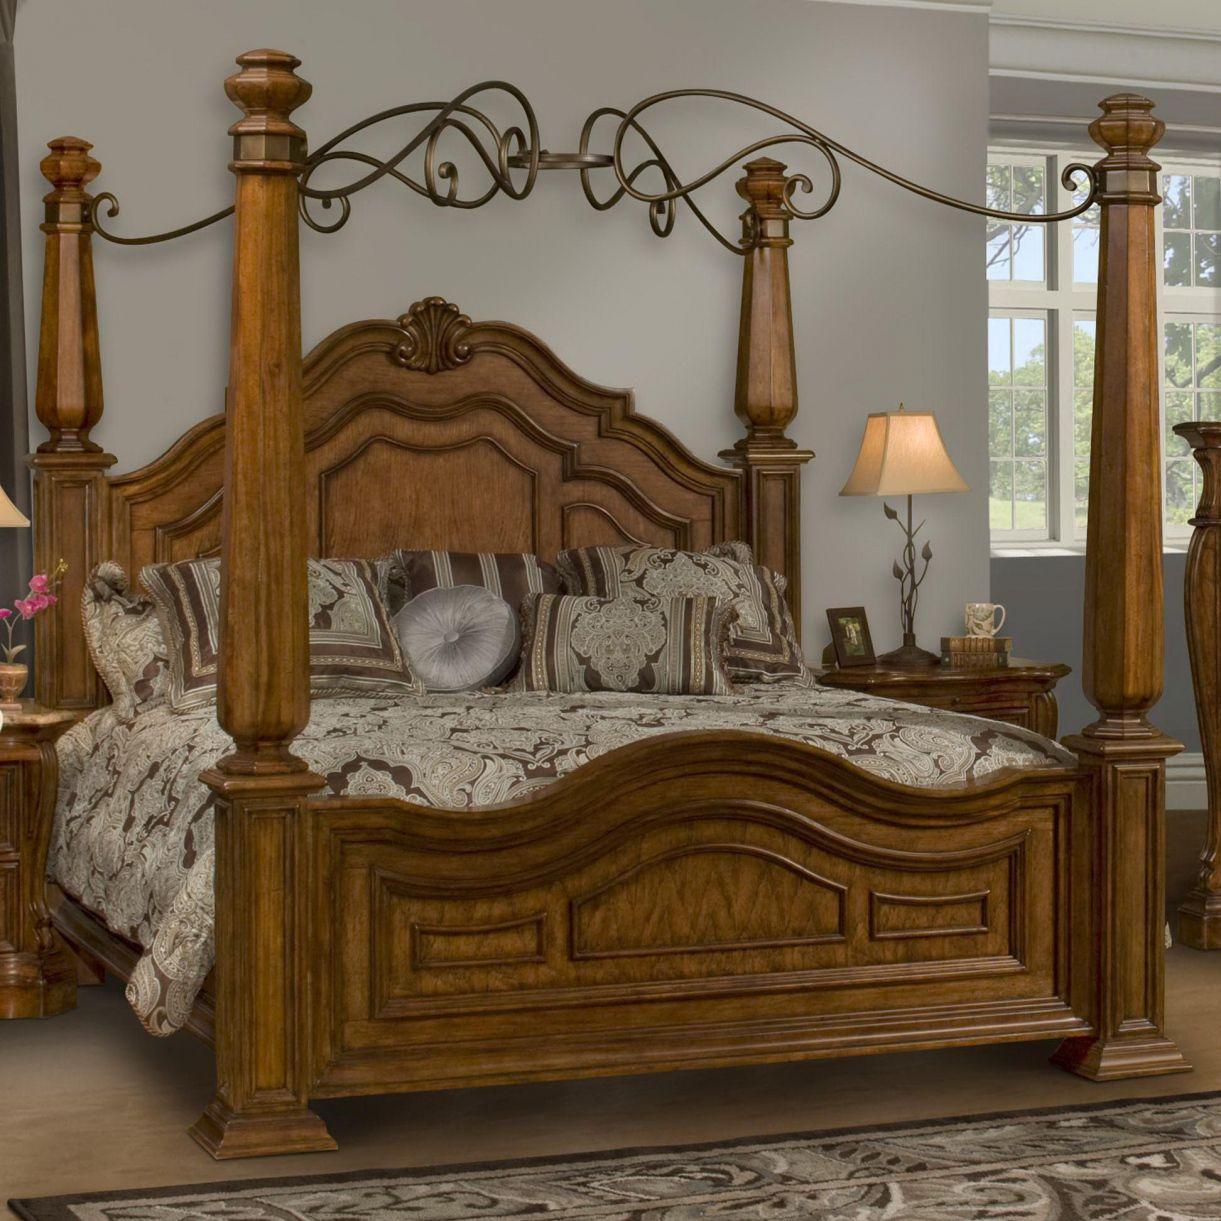 Endura Bedroom Furniture Modern Interior Design Check More At Http Www